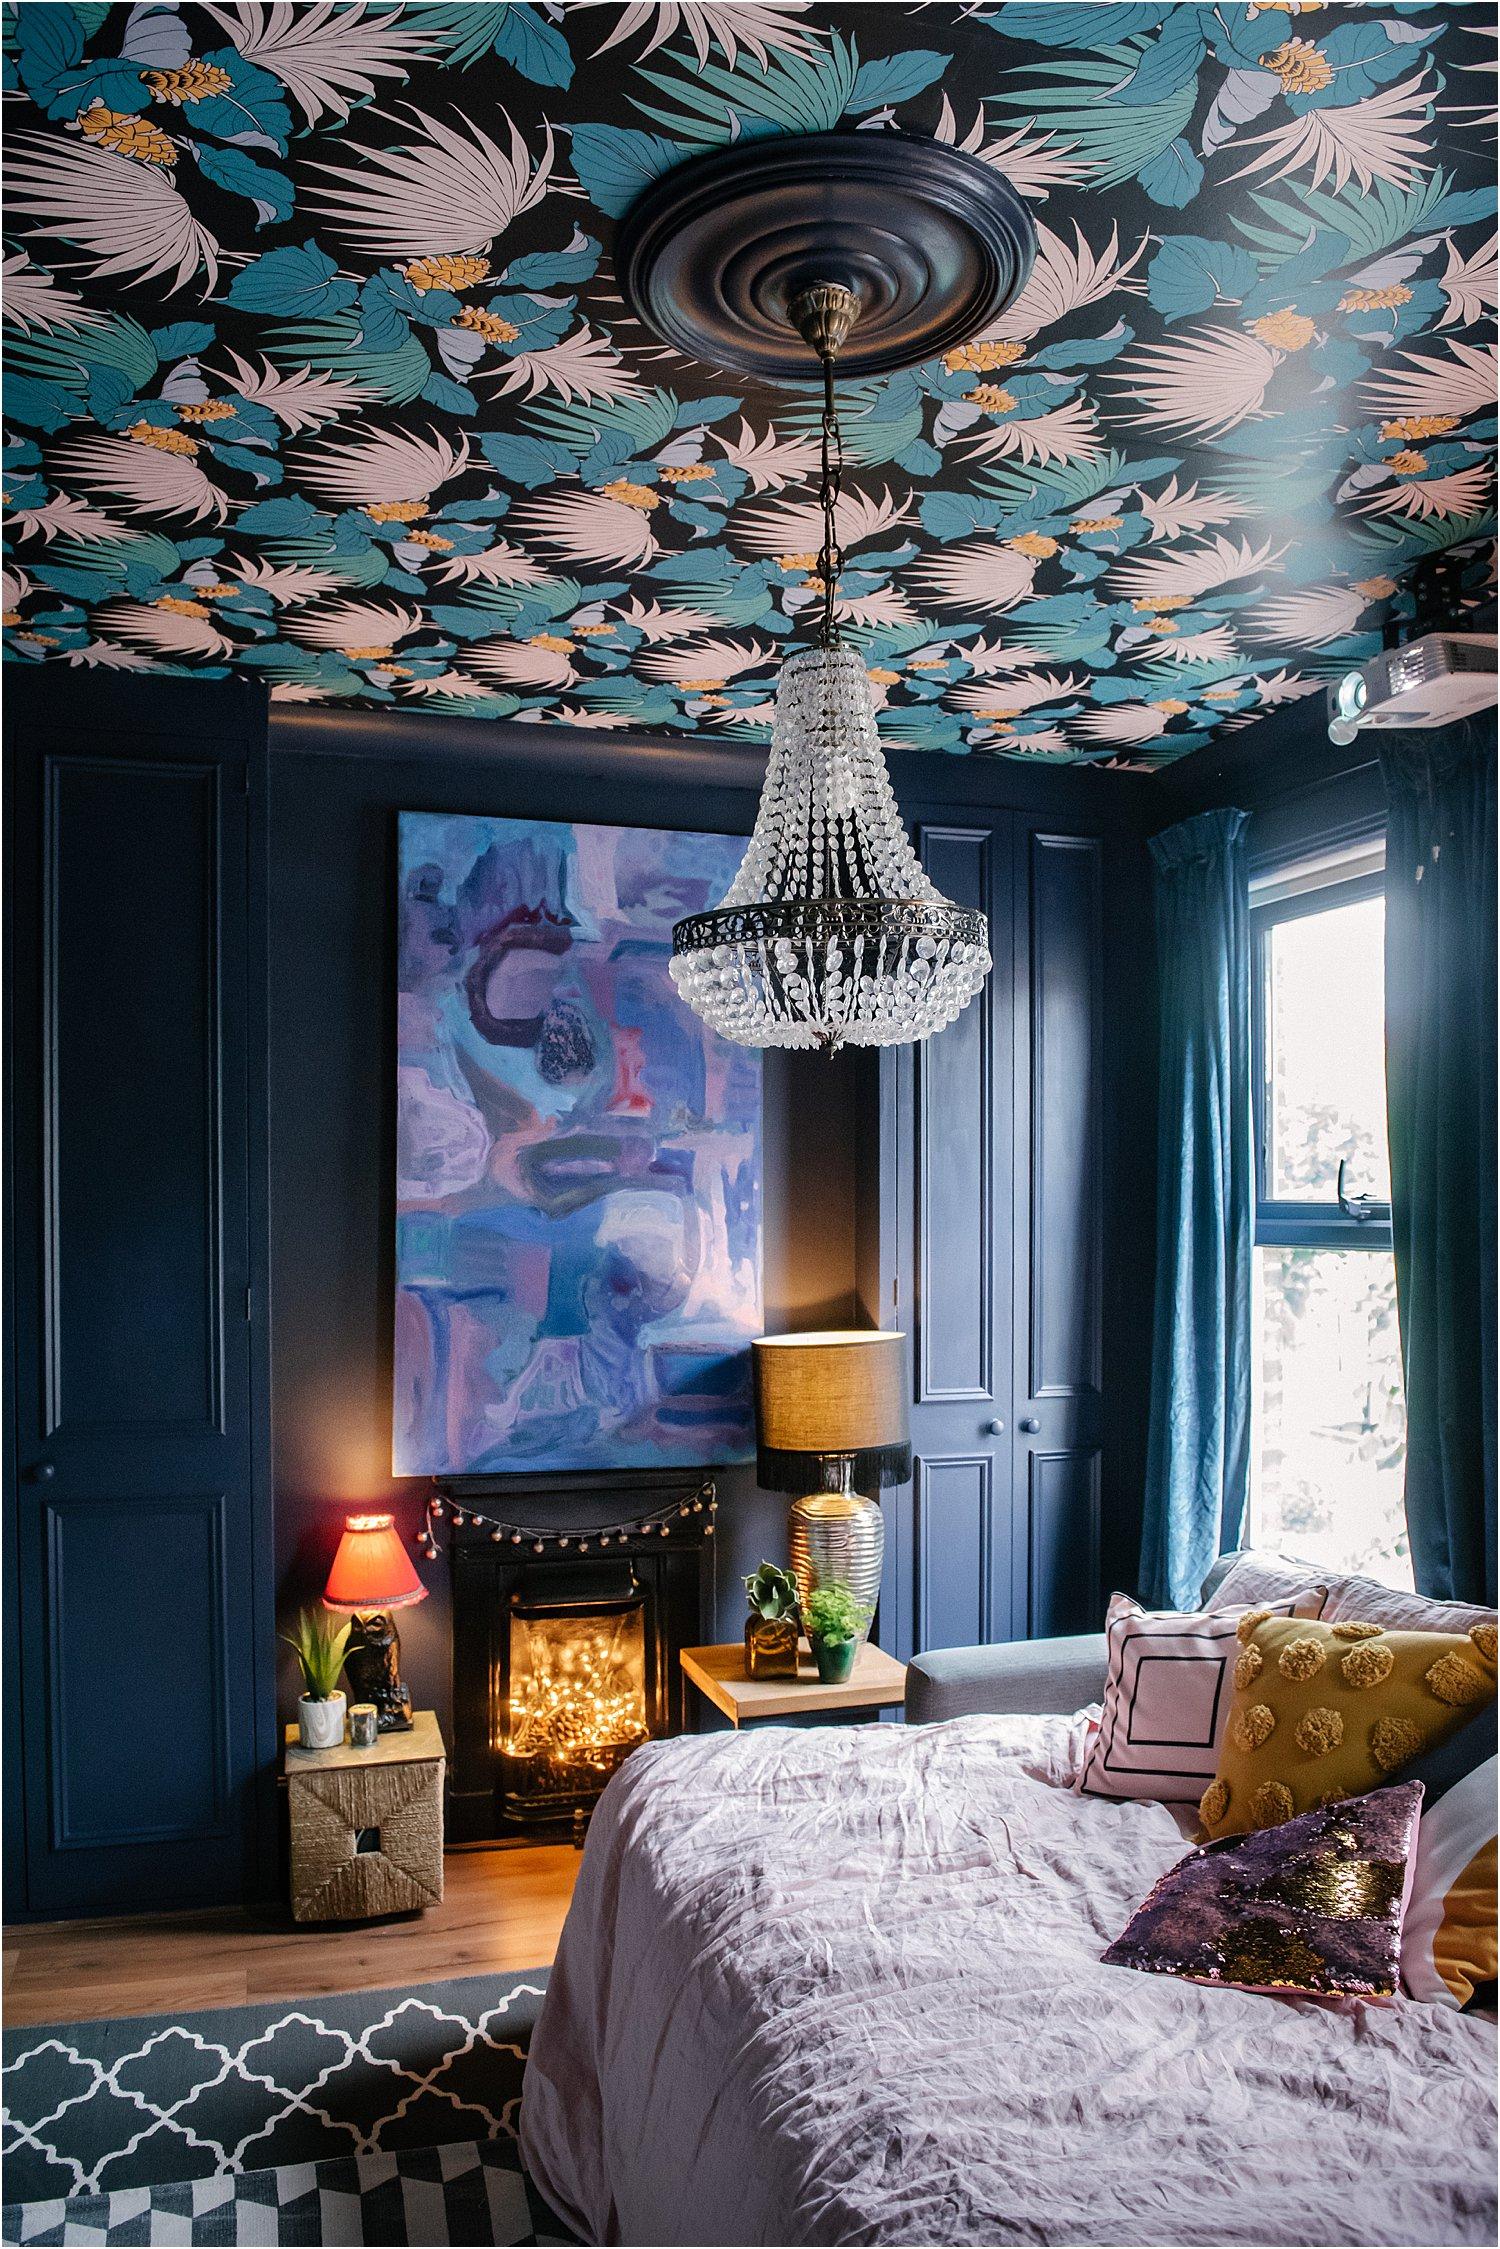 dark-blue-green-maximalist-interior-design-wallpaper-moody-layered-home